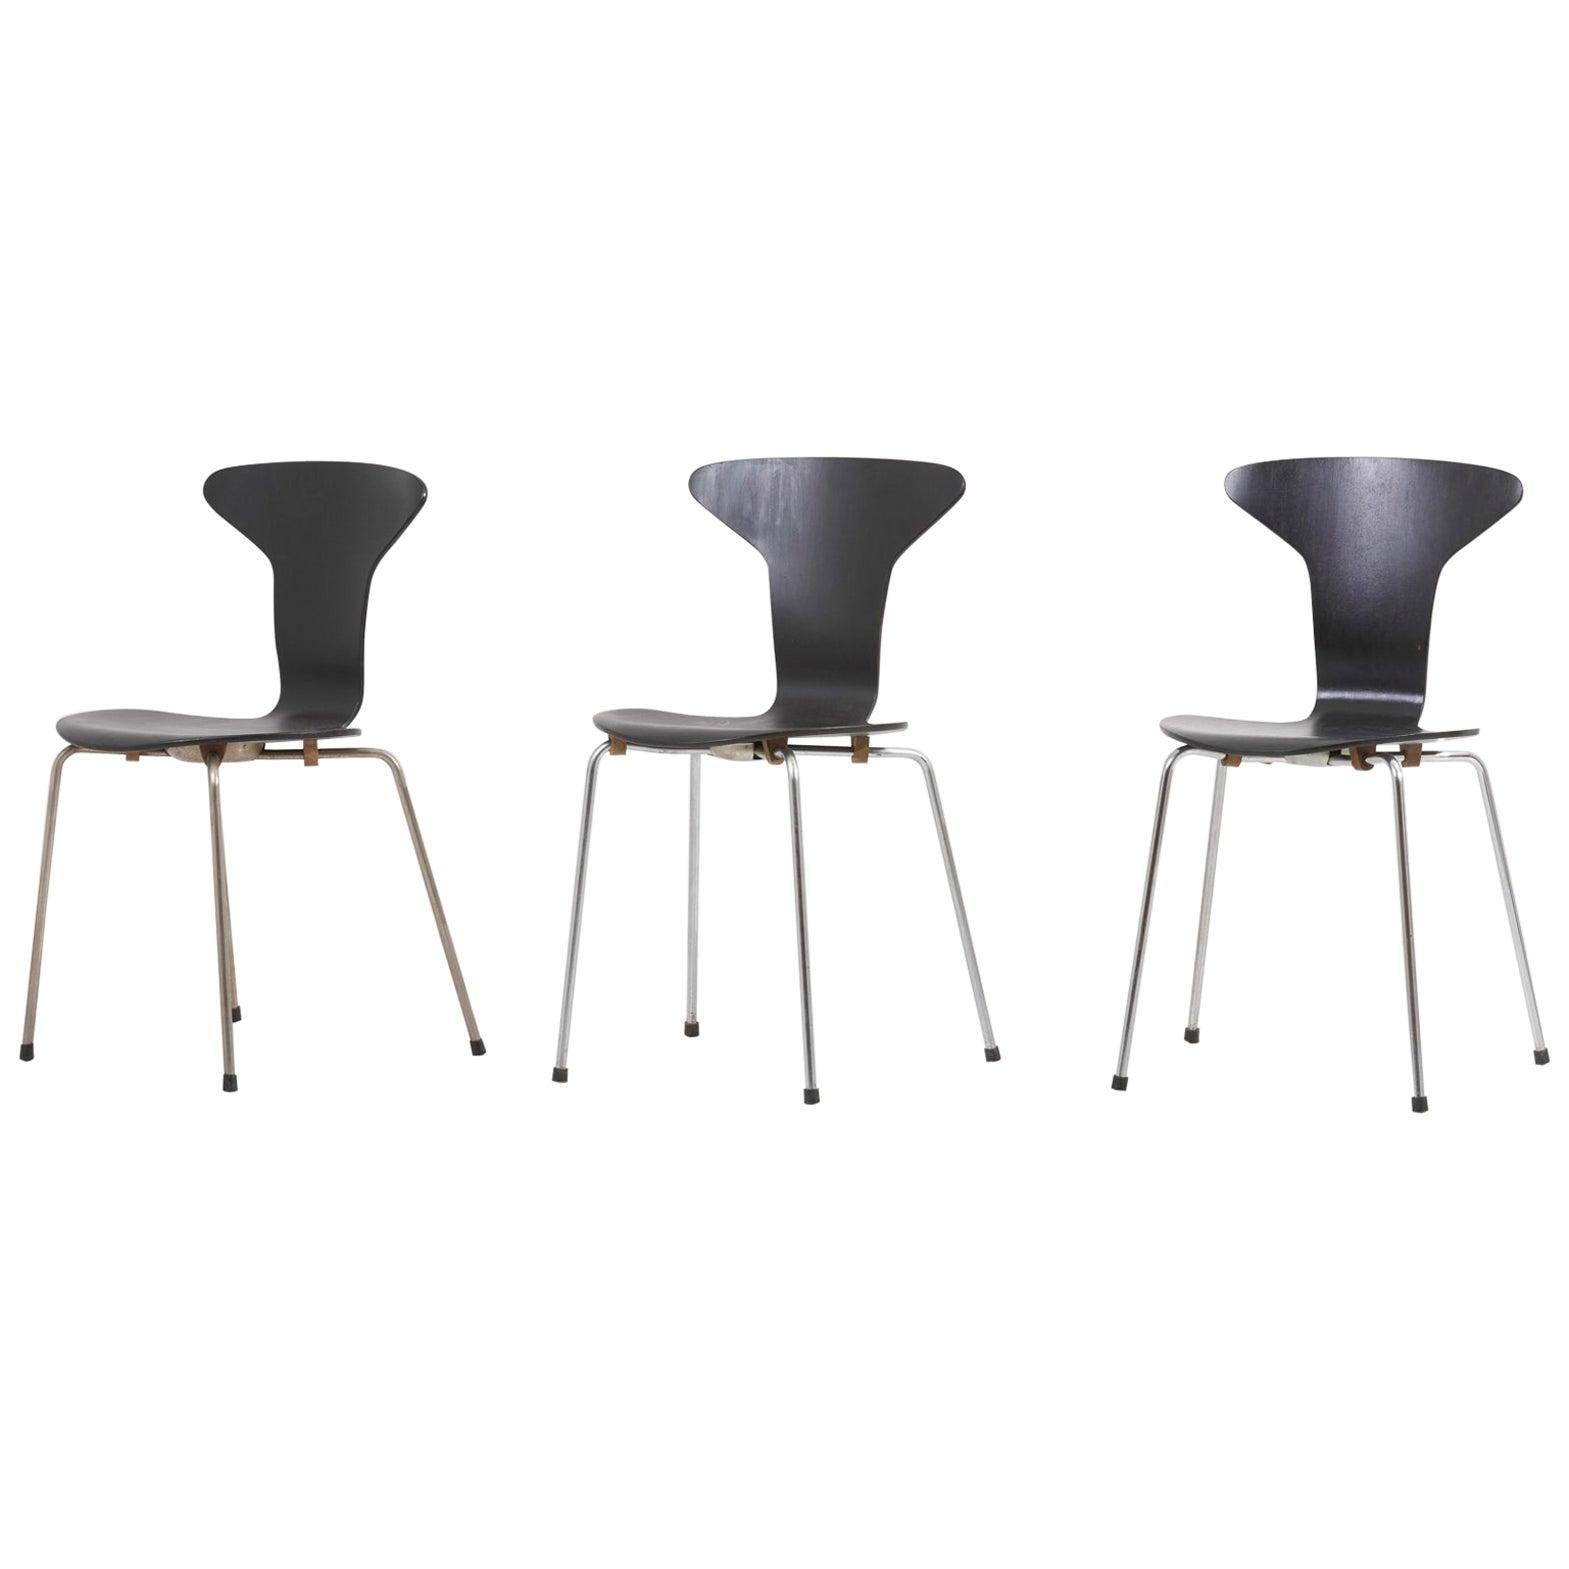 Set of 3 Mosquito Munkegård Dining Chairs by Arne Jacobsen, Denmark, 1950s